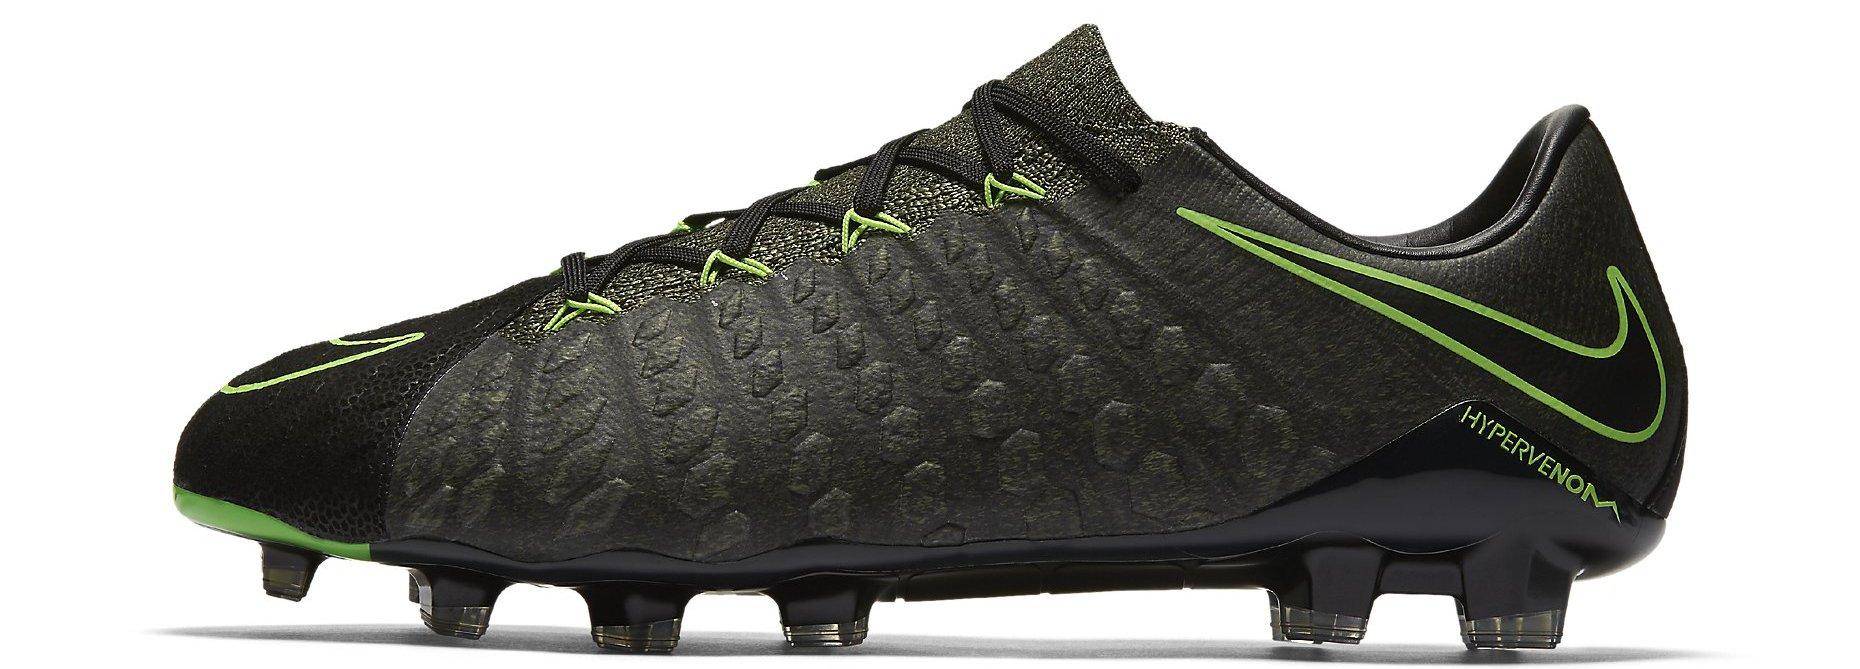 Football shoes Nike Hypervenom Phantom III FG Tech Craft